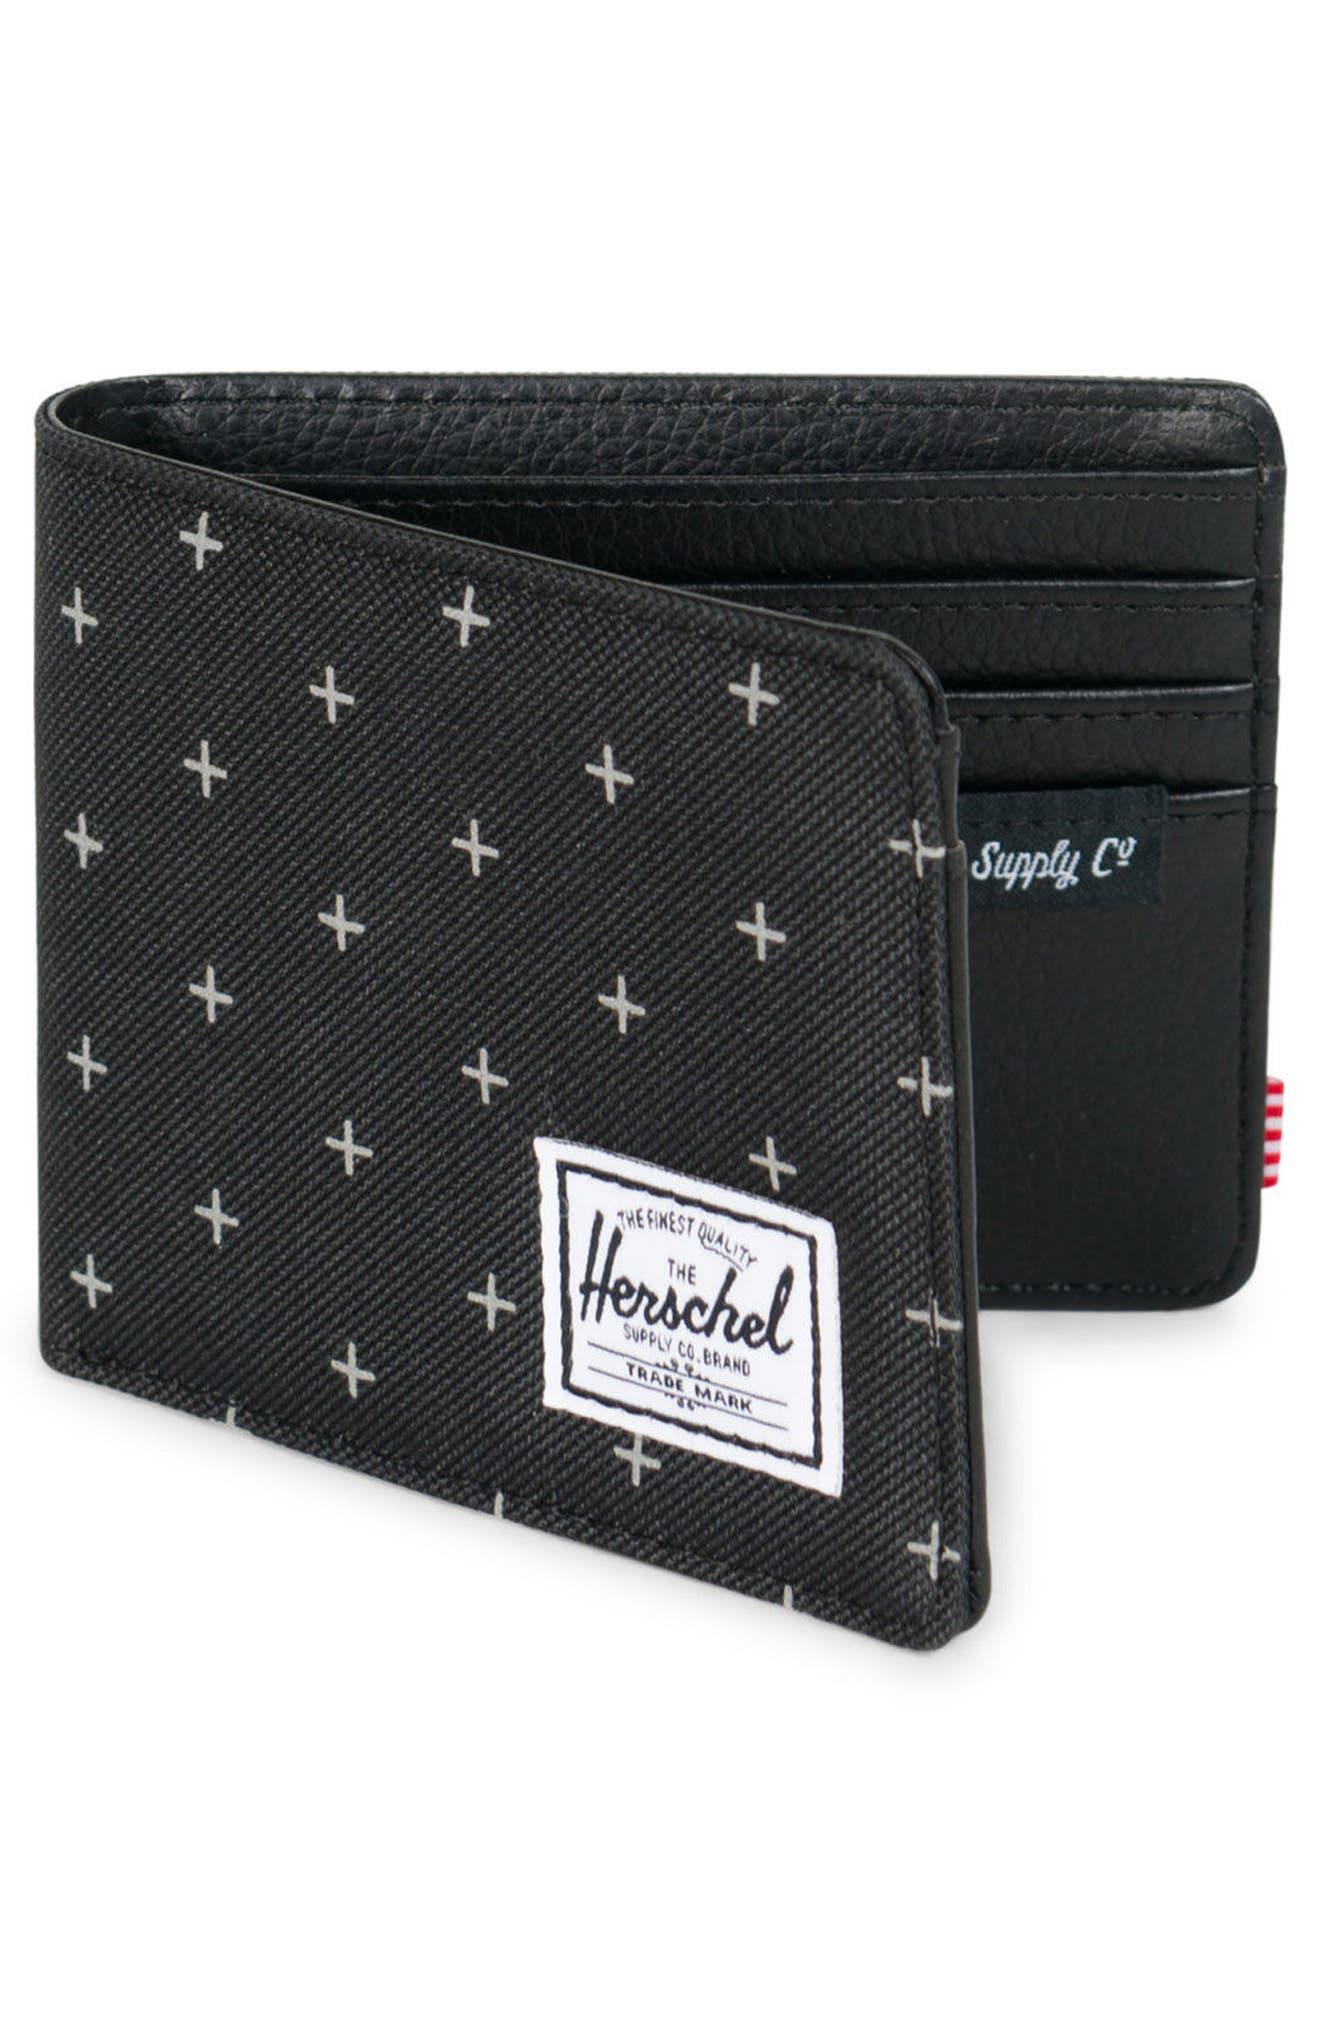 Hank RFID Wallet,                             Alternate thumbnail 3, color,                             Black Gridlock/ Black Leather